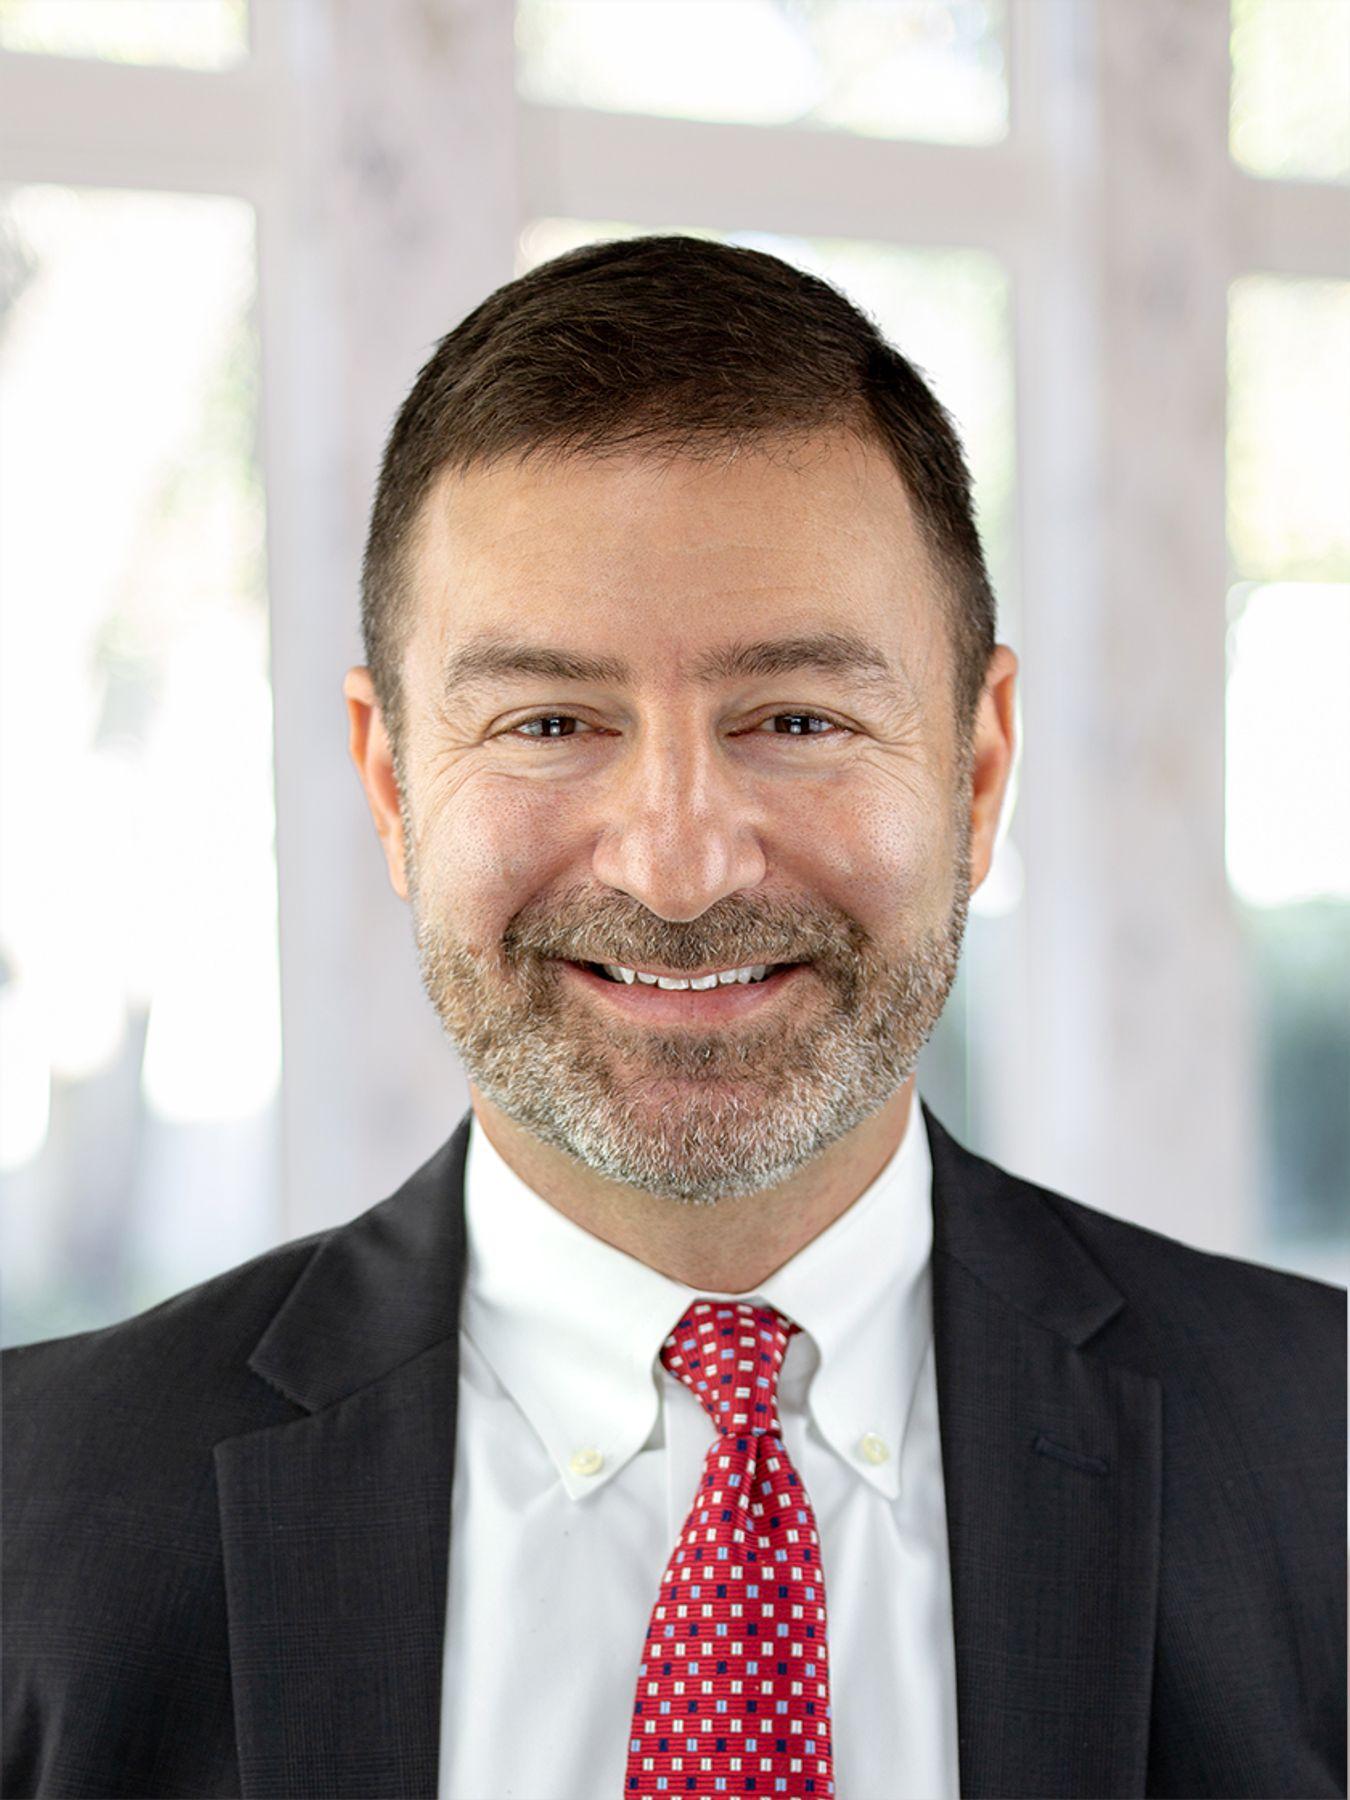 Daniel J Pleason